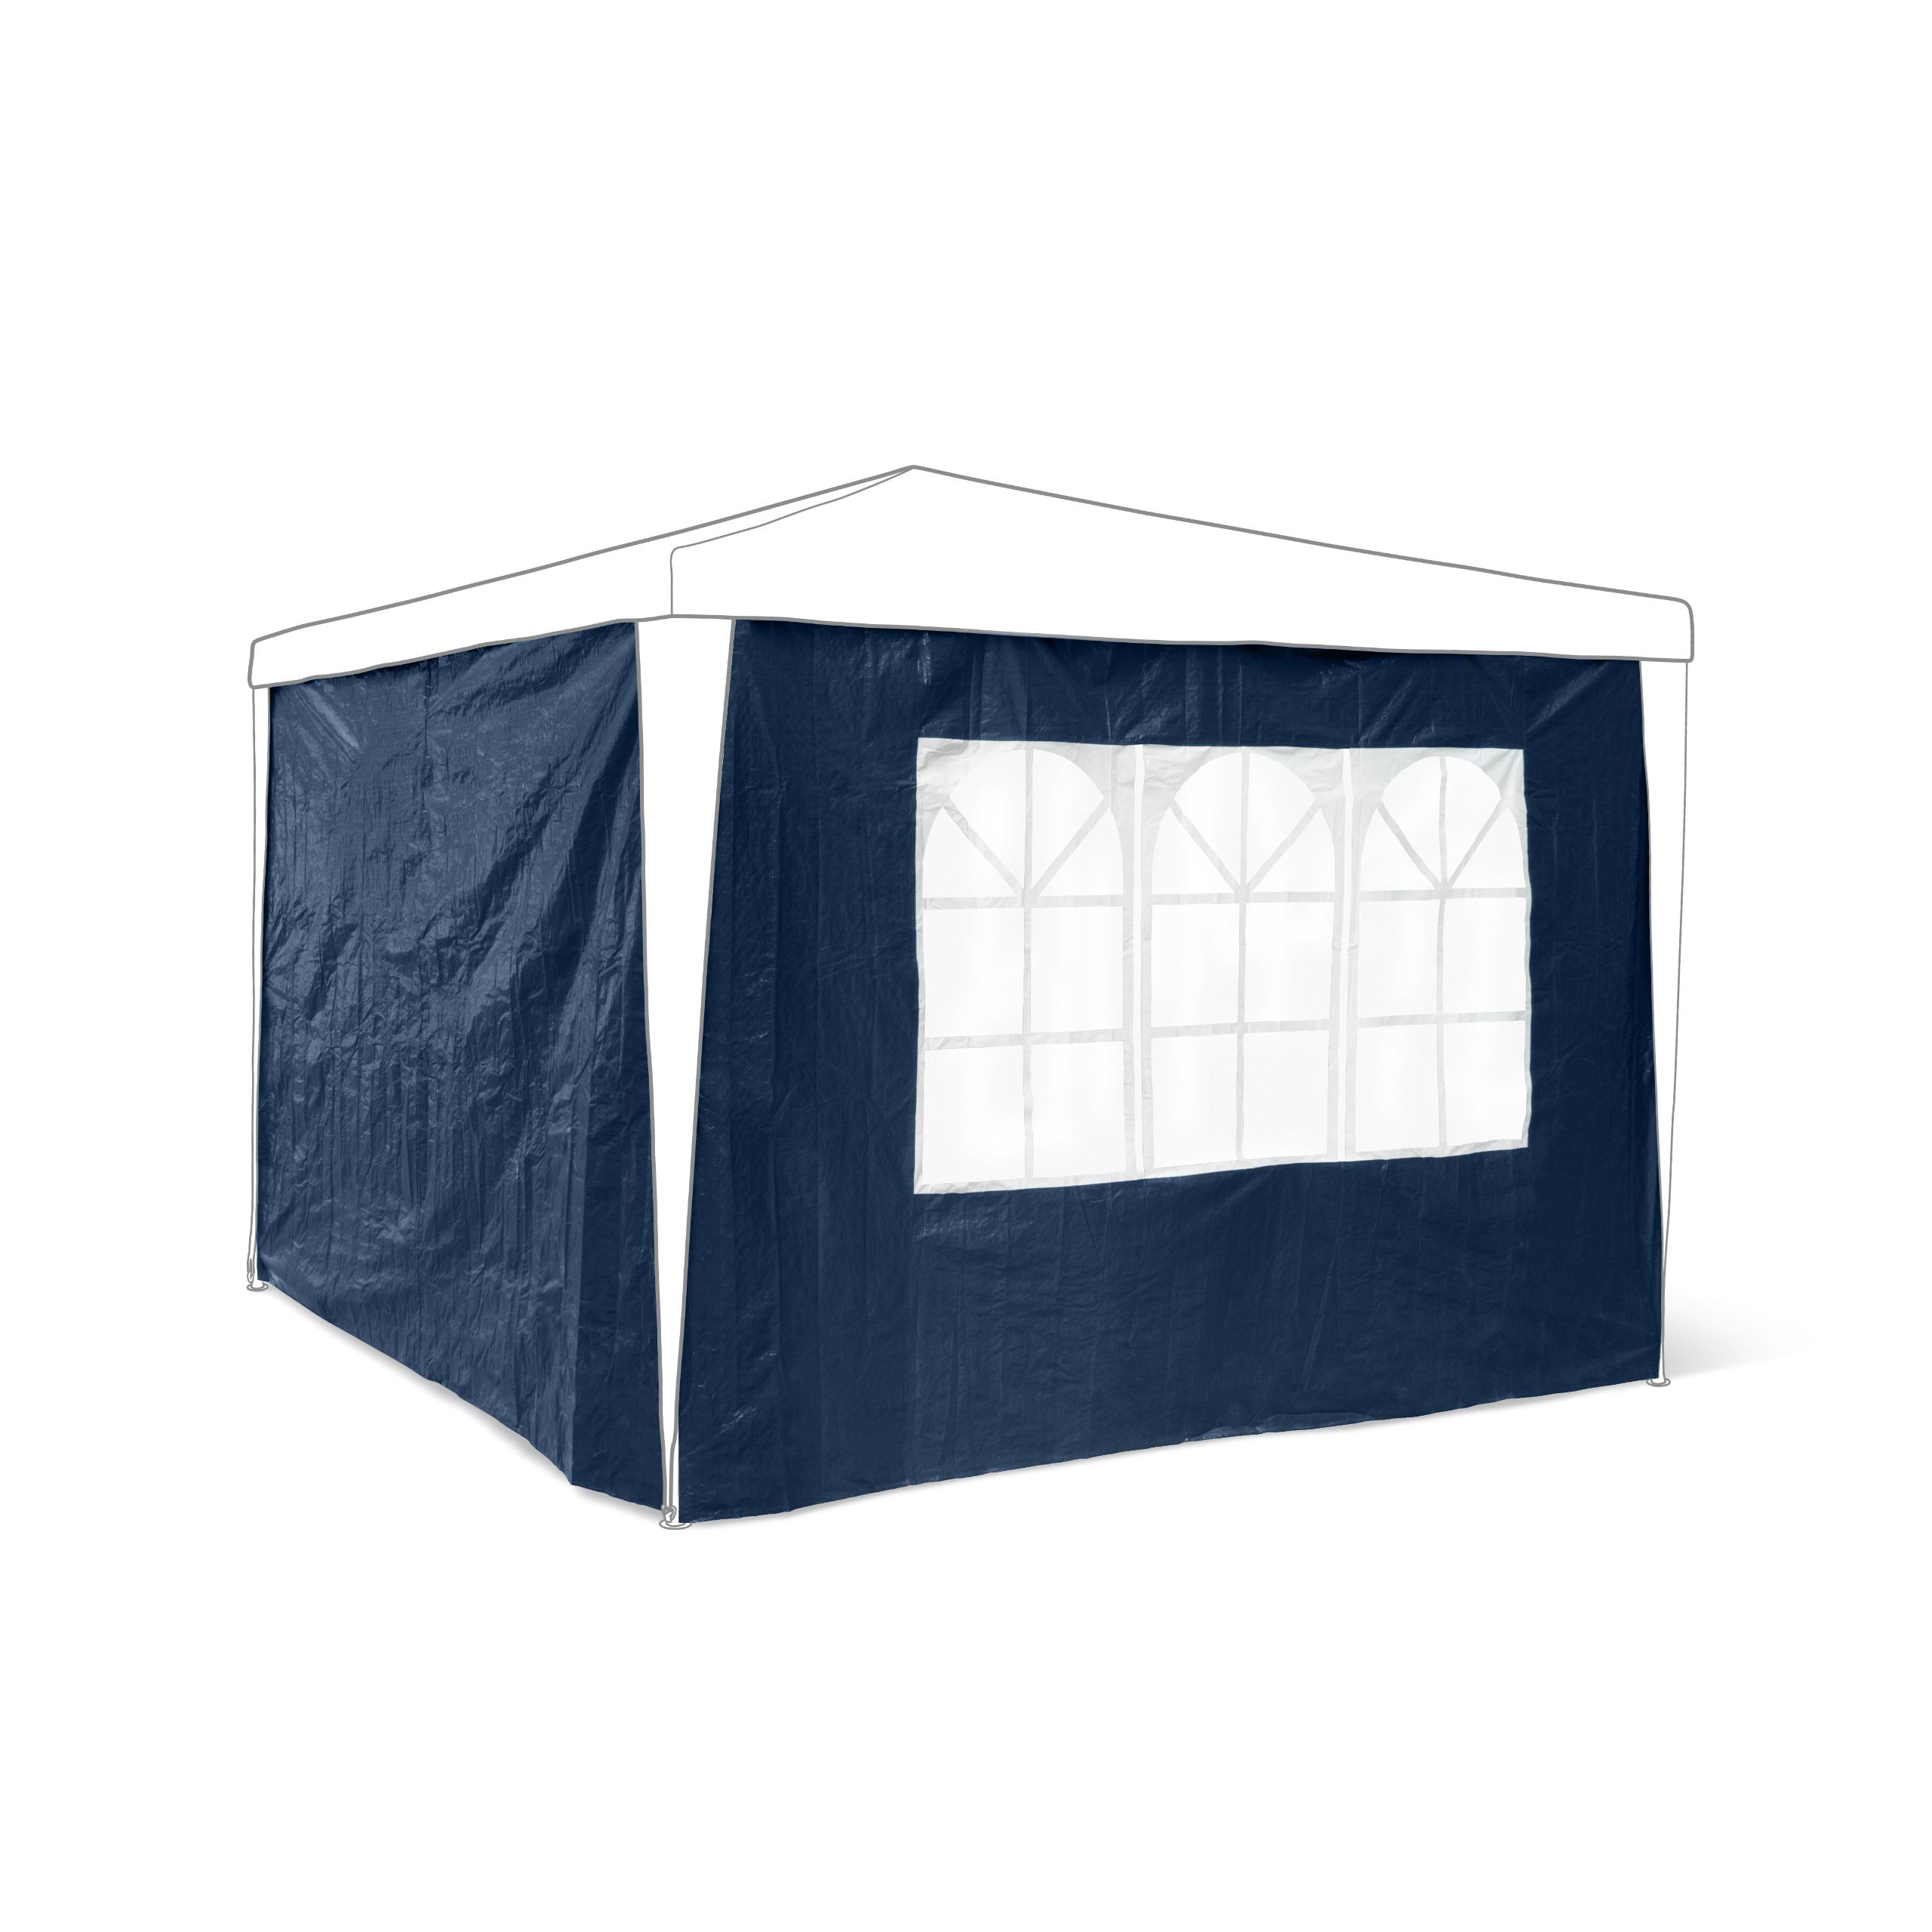 Pavillon-Seitenteile-2-Teile-Seitenwand-Pavillion-Partyzelt-Gartenpavillion-3x3m